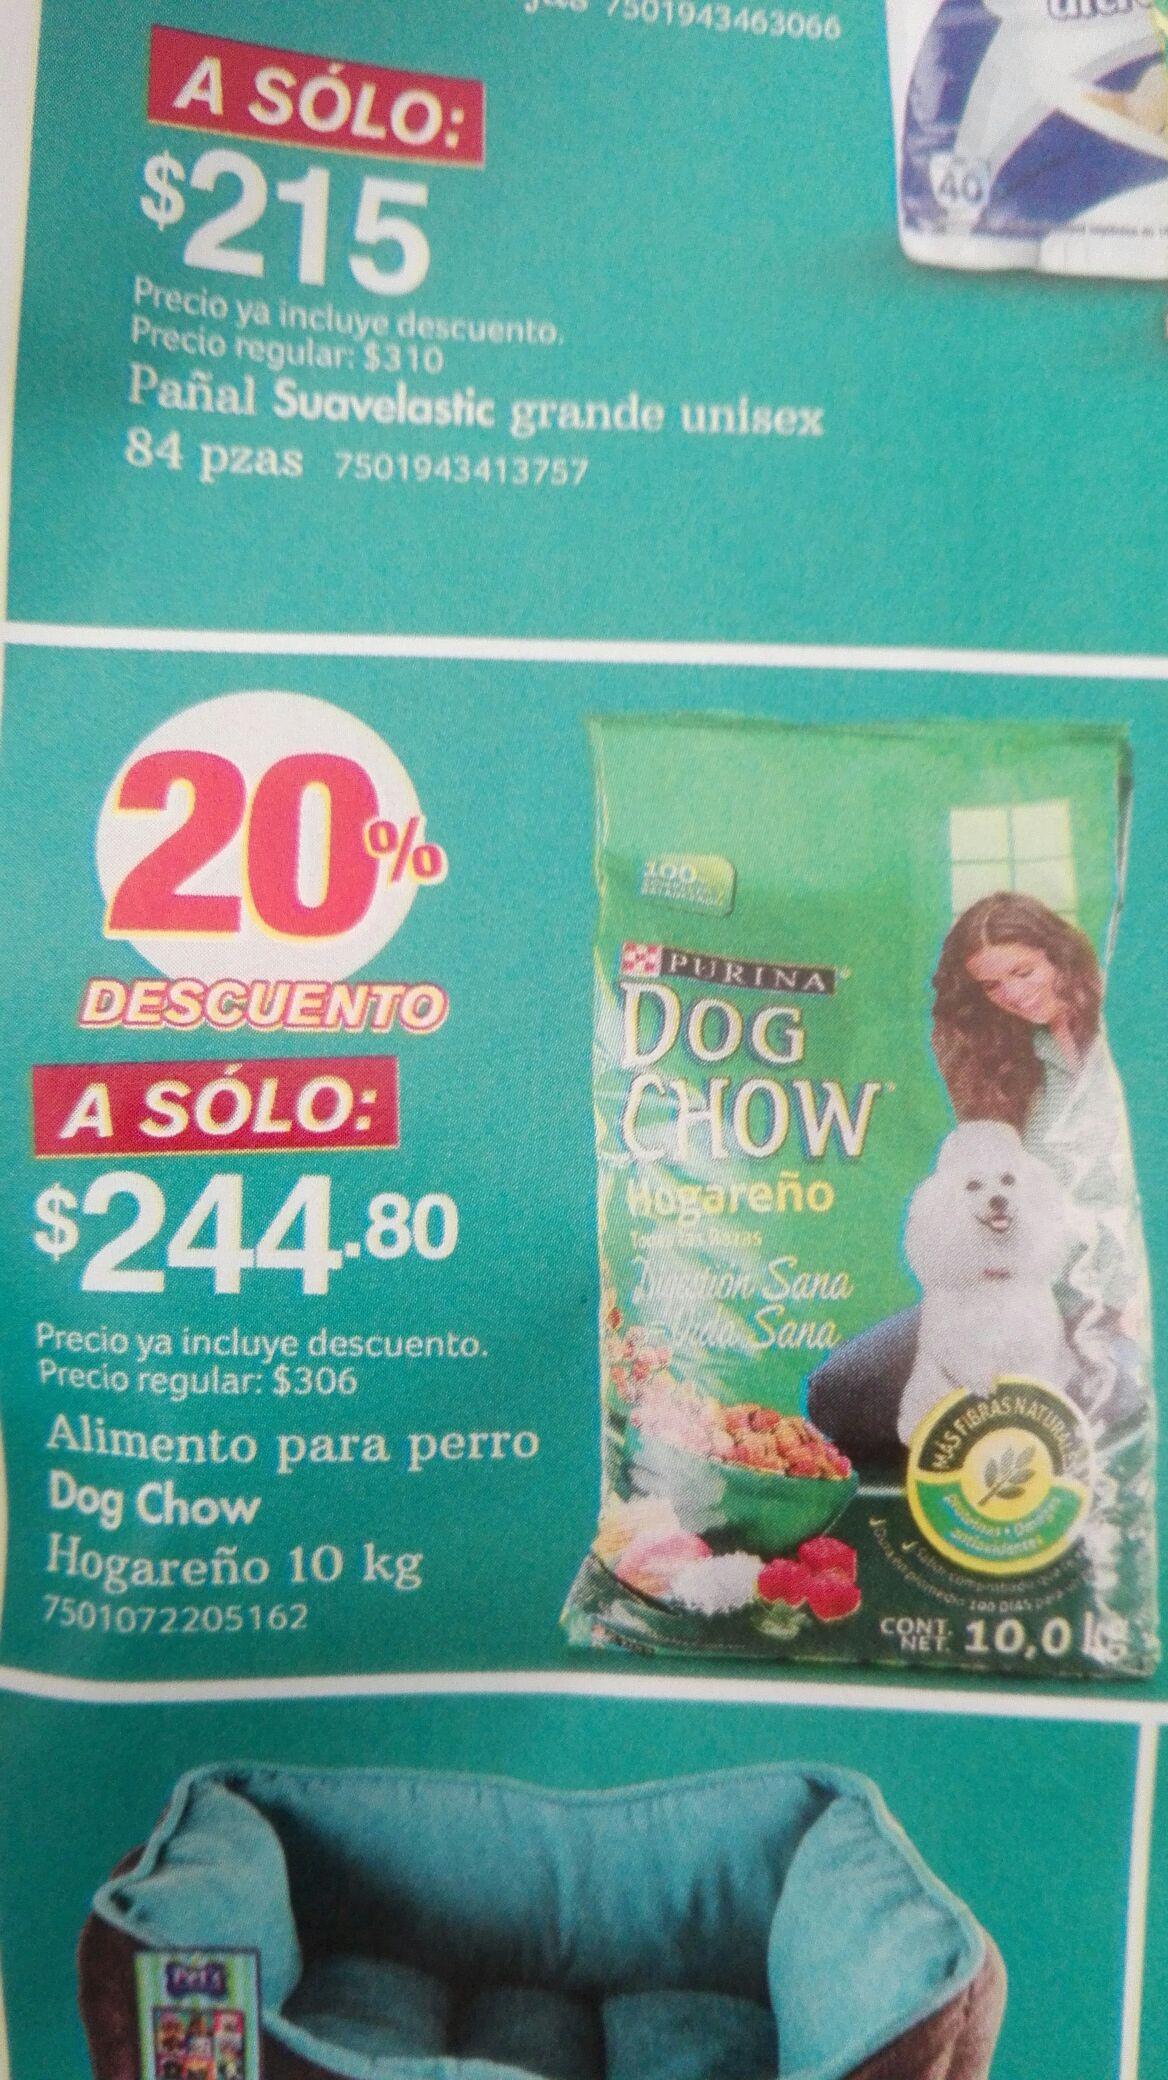 City Club: Alimento para perro Dog Chow 10 kg